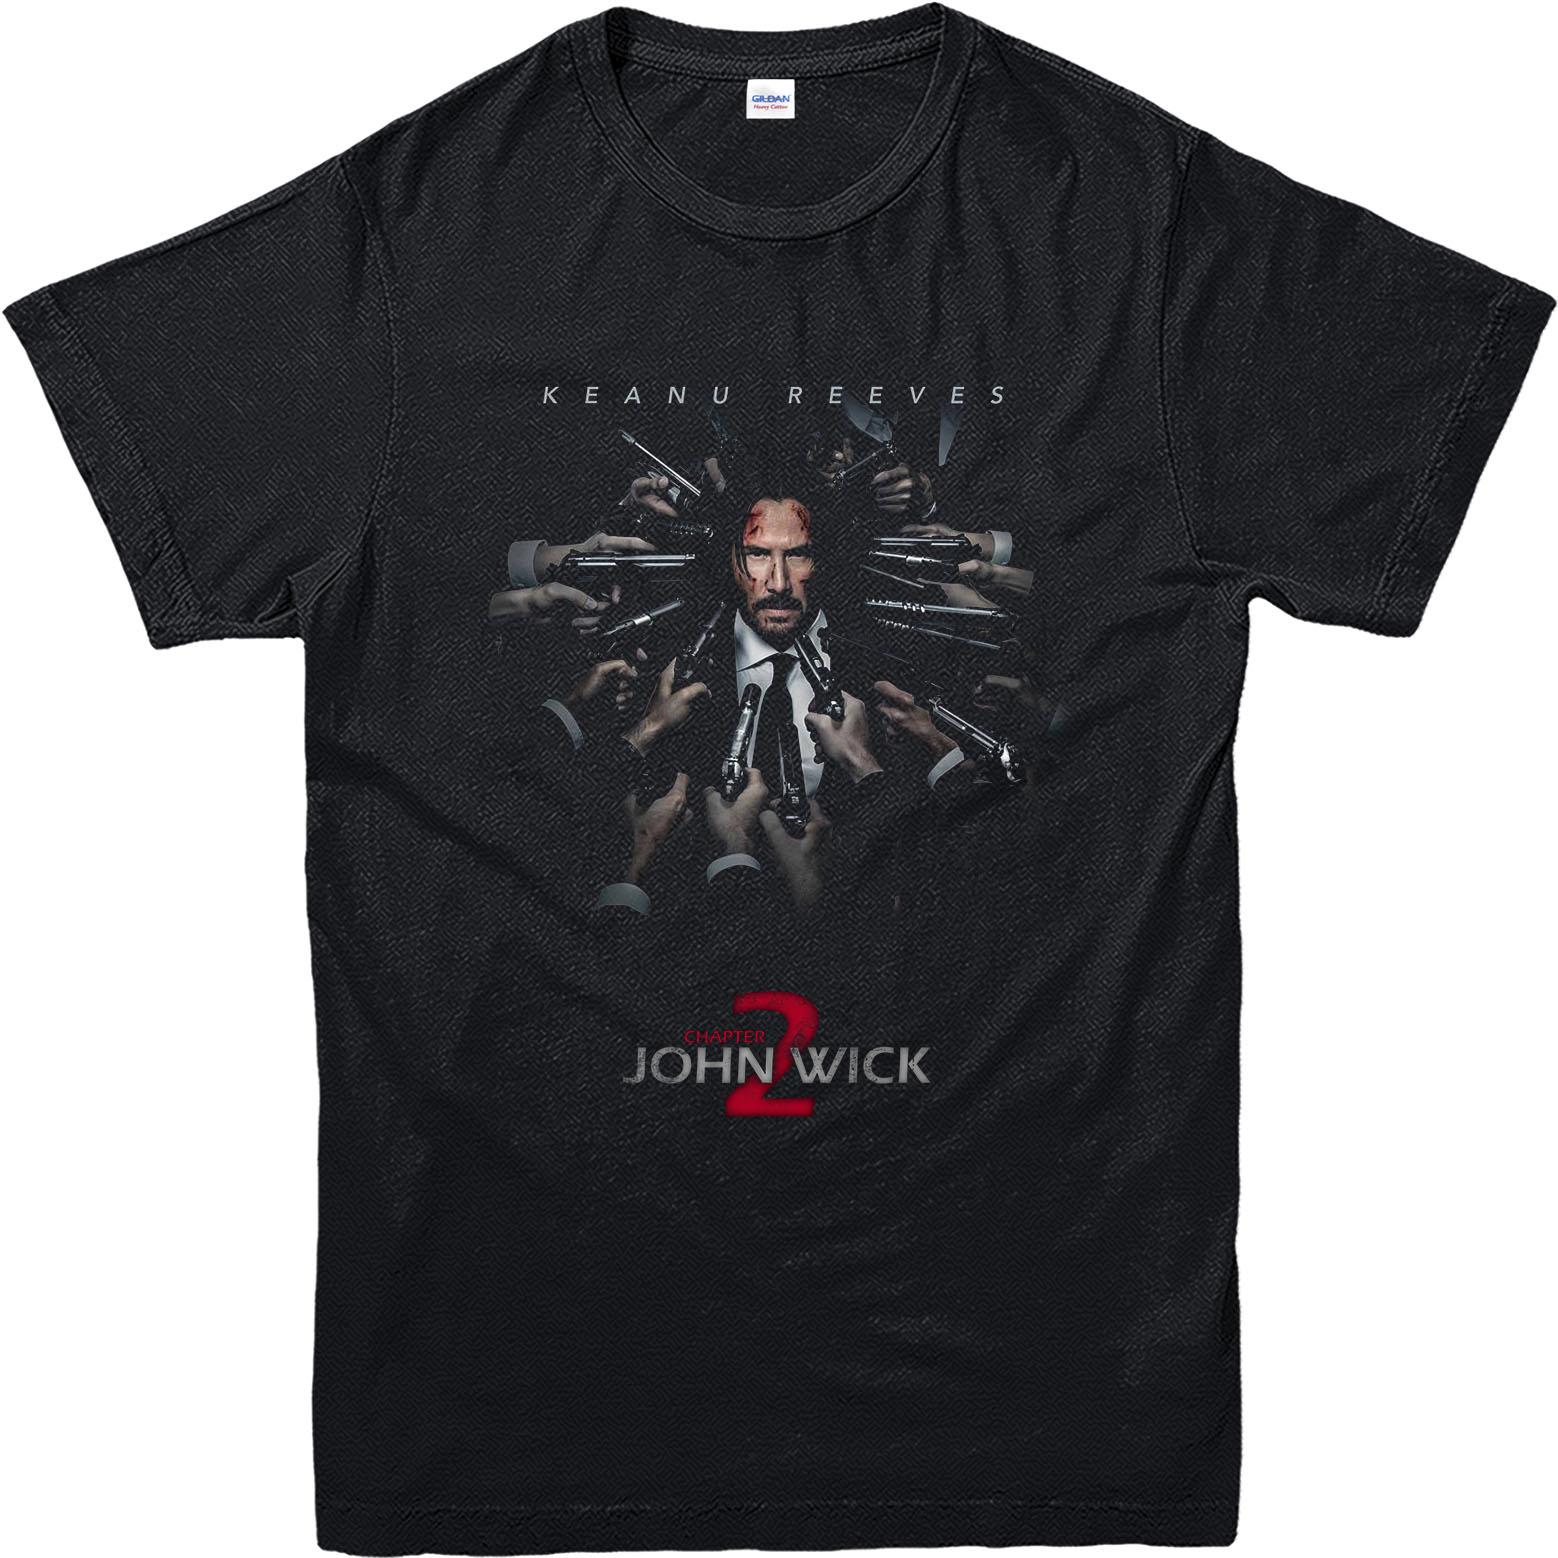 Shirt ke design - John Wick T Shirt Keanu Reeves Poster T